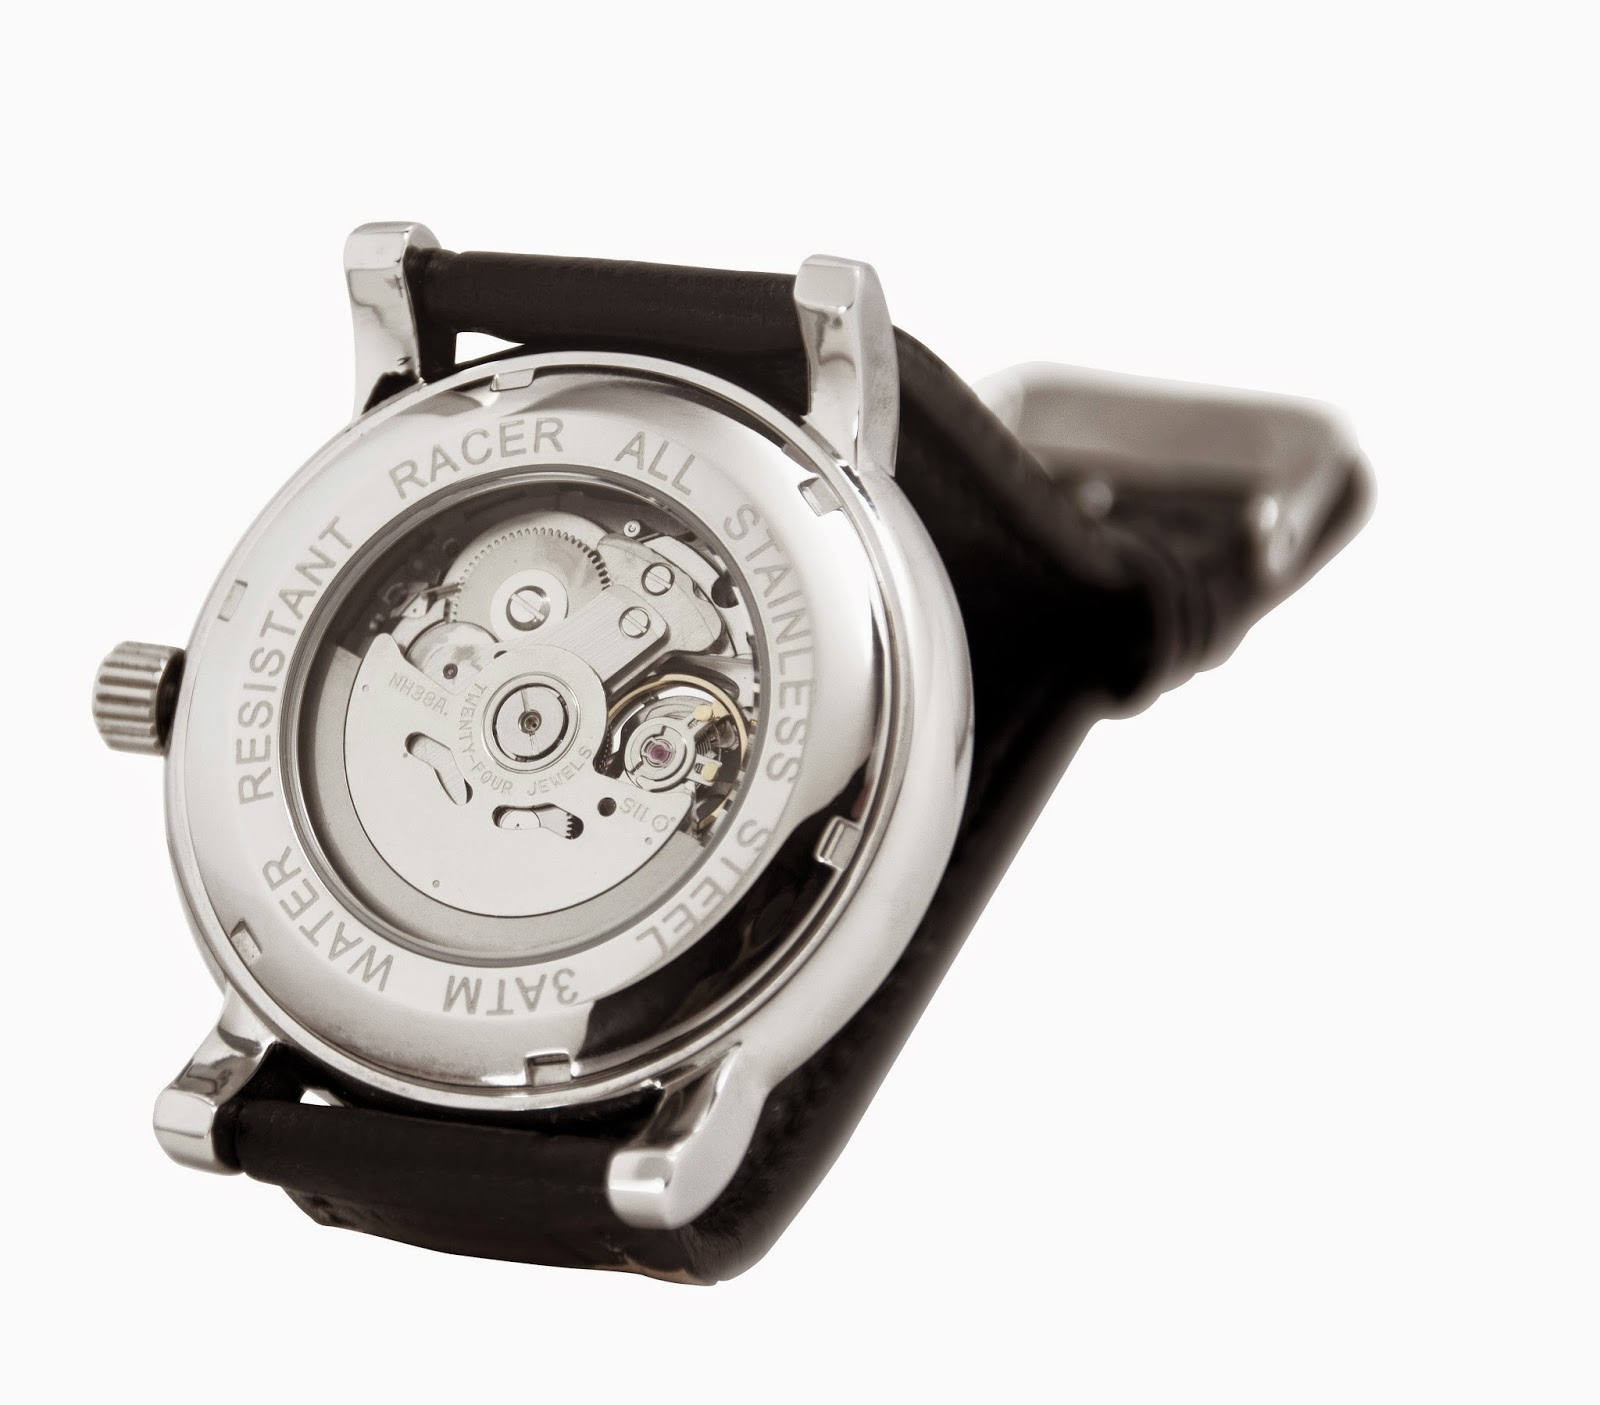 A-100, automático, día del padre, Racer, regalos, relojes, Suits and Shirts, watches,